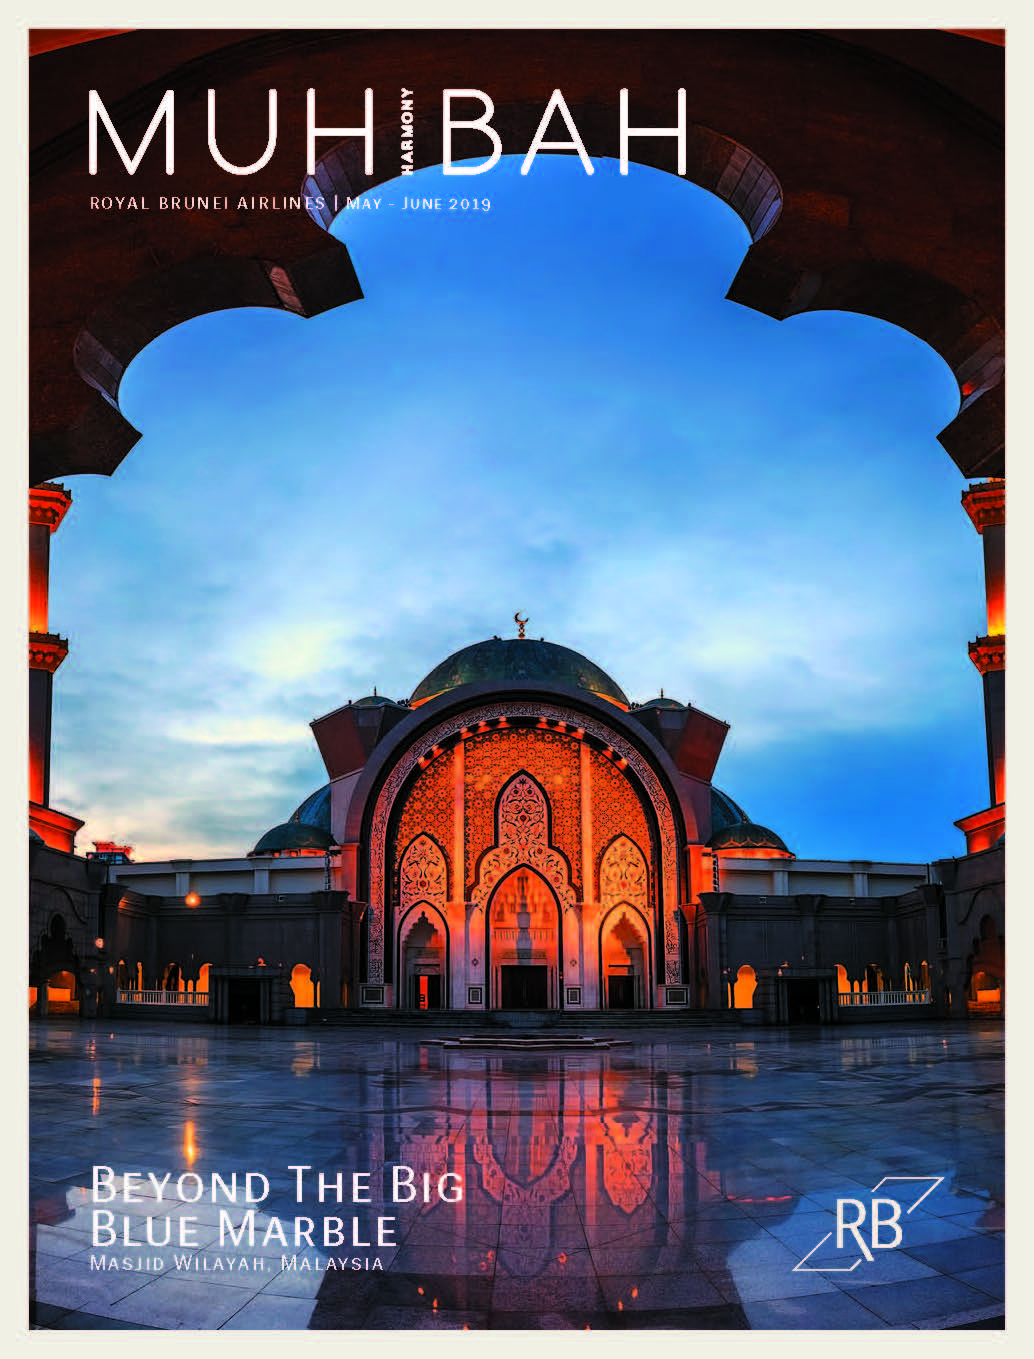 2019.05 06 Muhibah Royal Brunei Airlines COVER